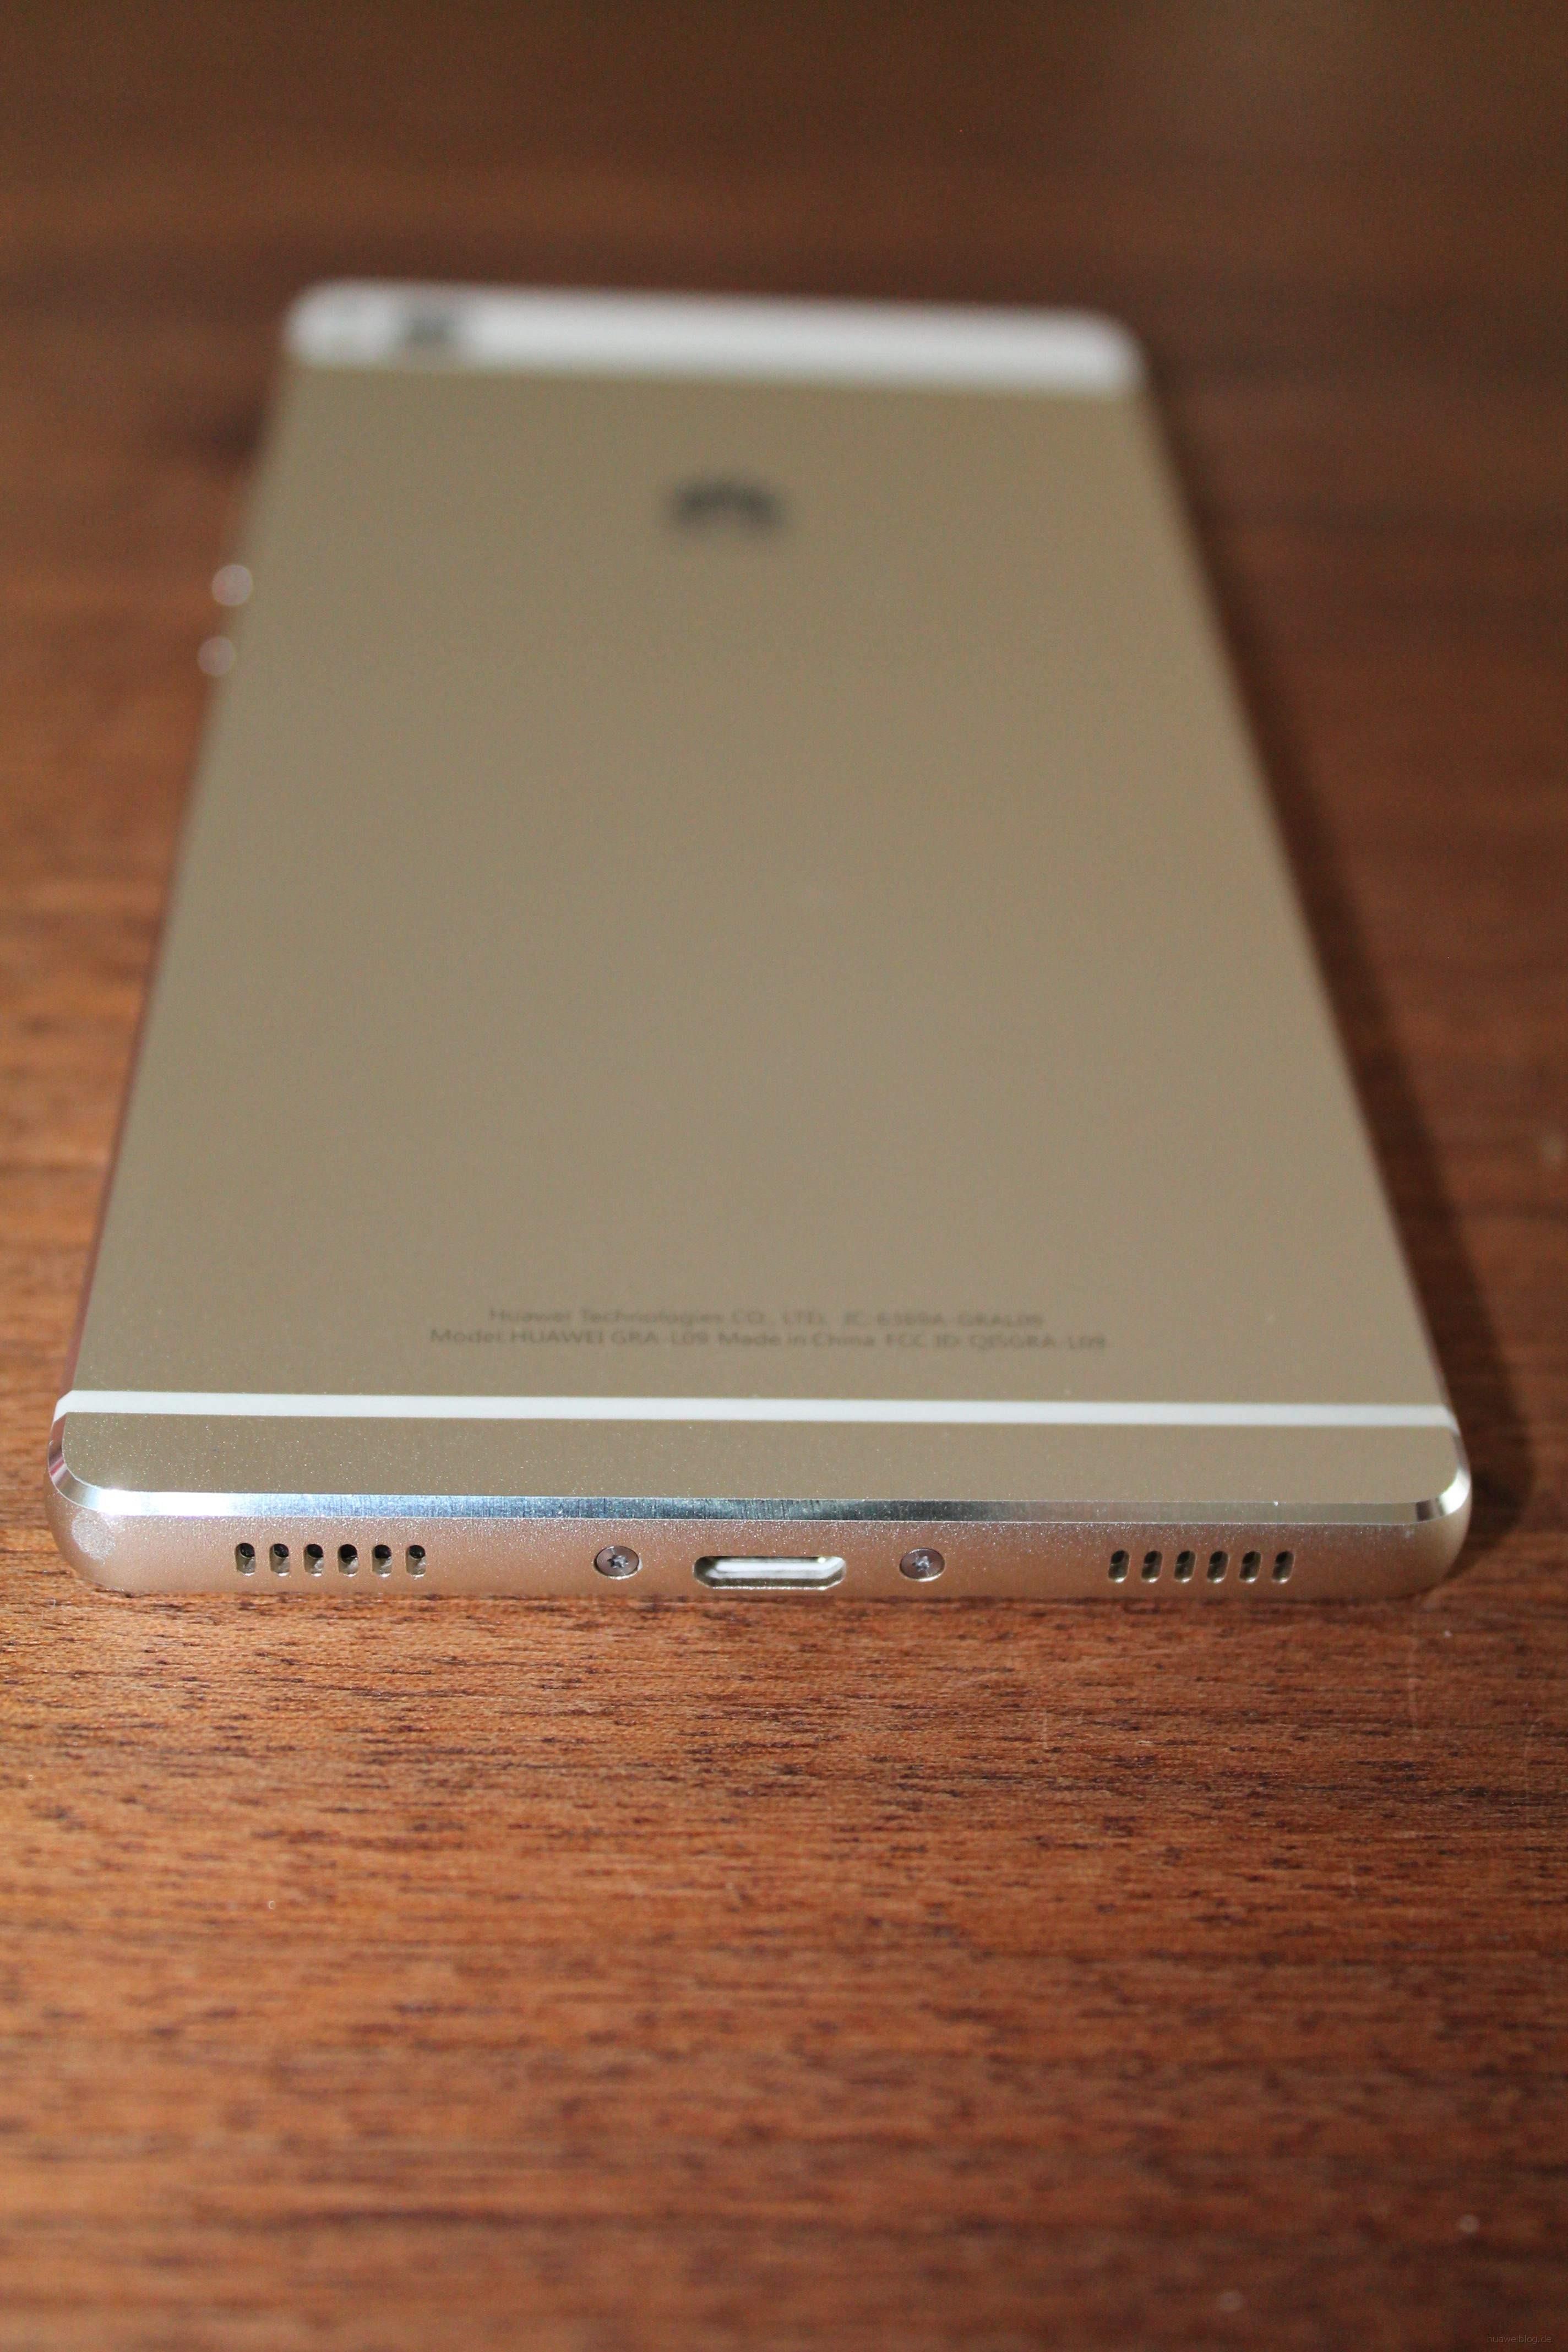 Huawei P8 Rückseite Unterseite USB Lautsprecher Mikrofon Kunststoffeinlassung